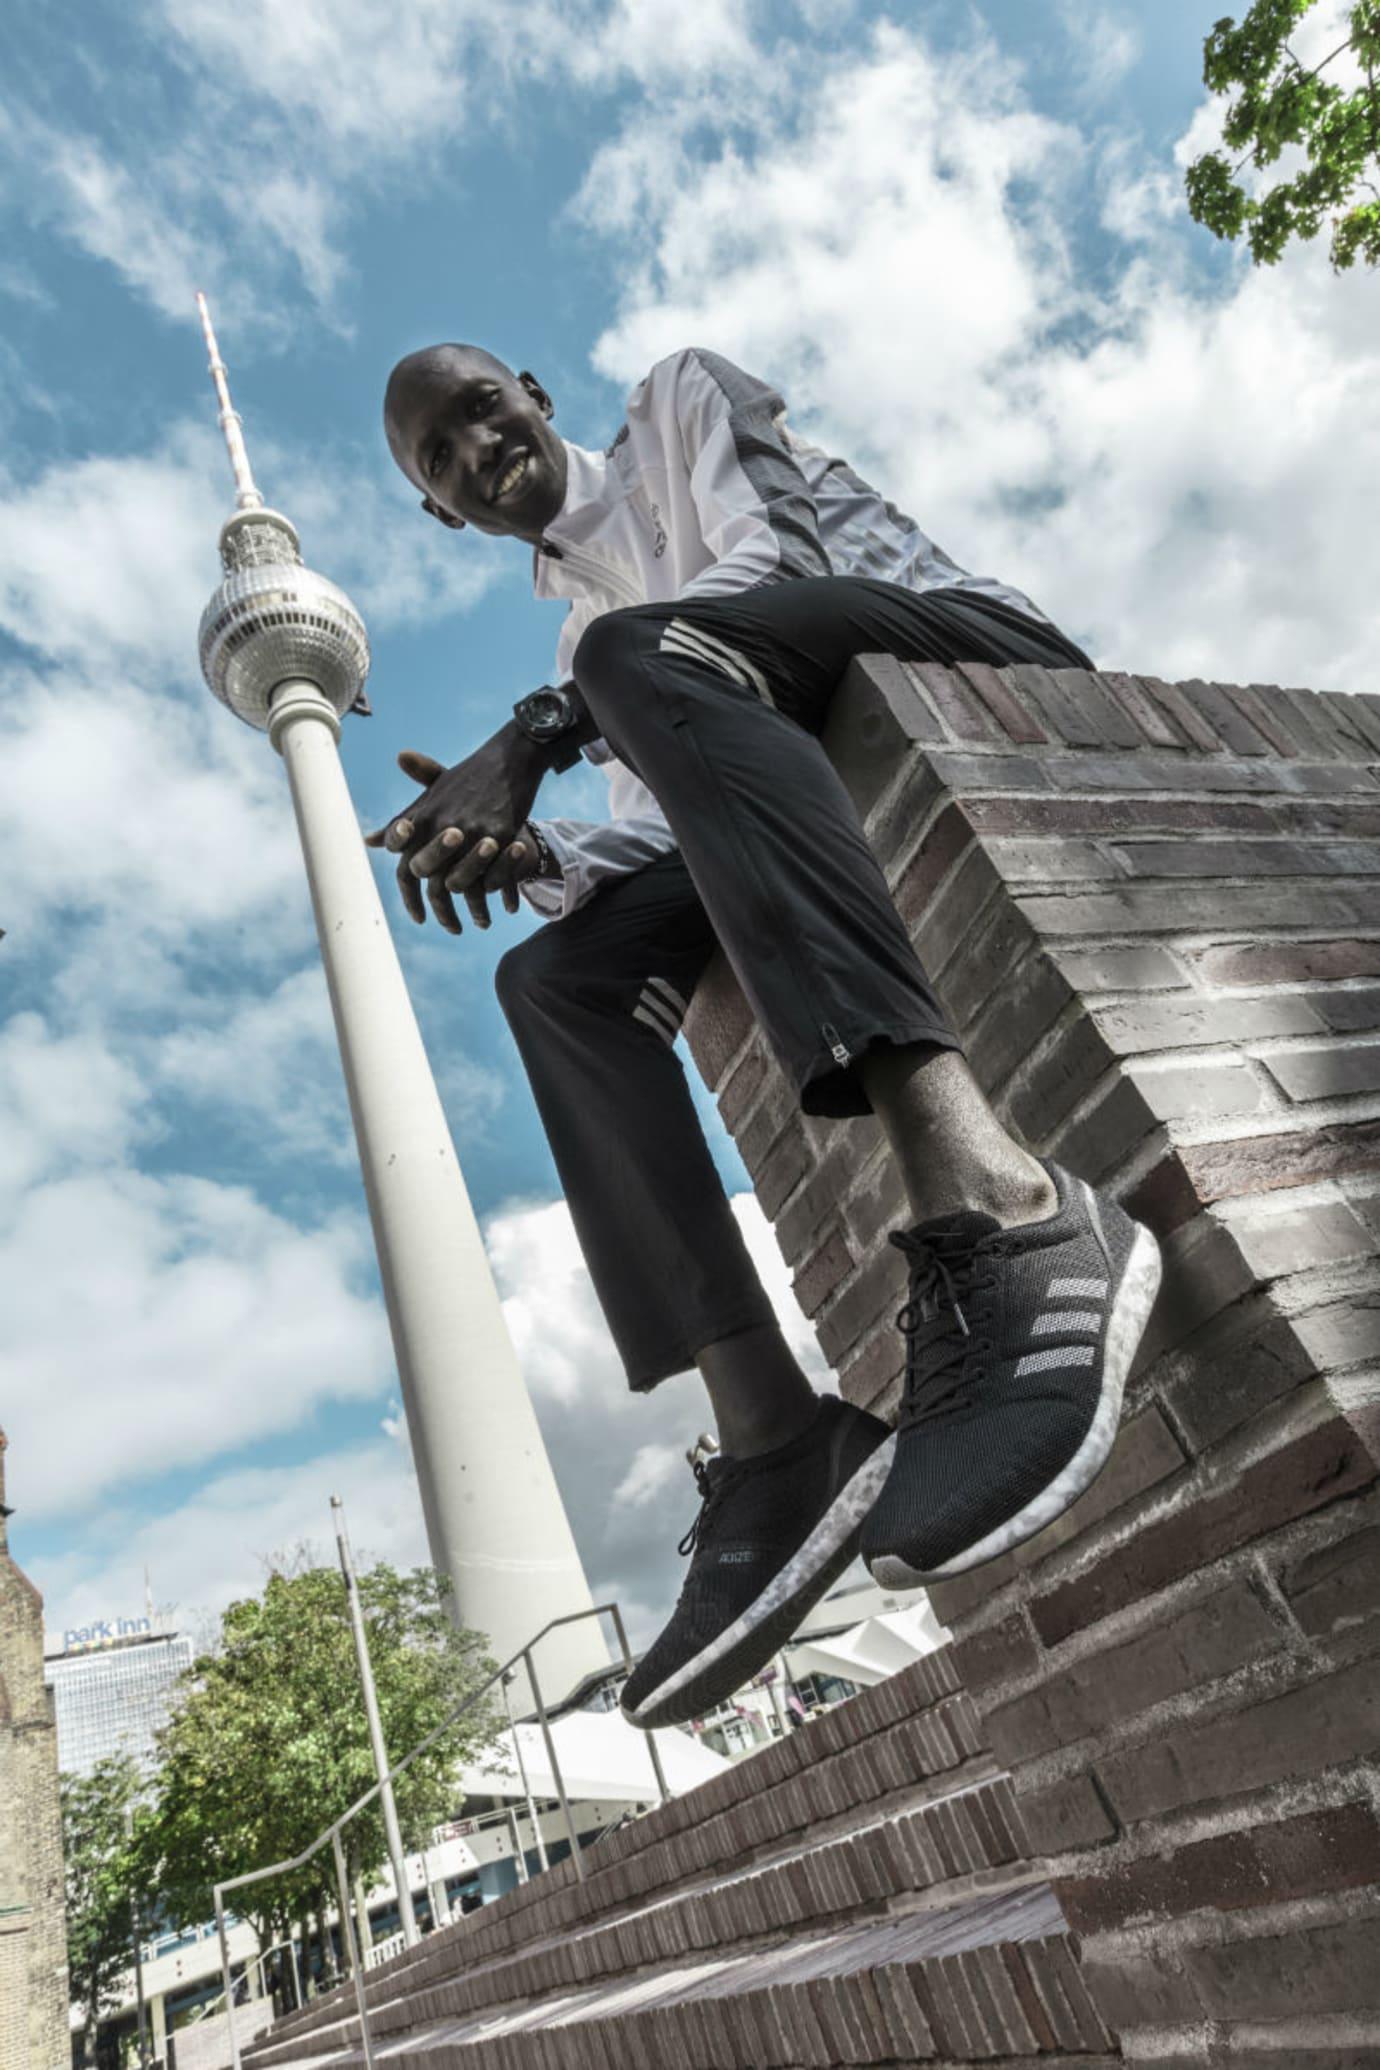 Wilson Kipsang Wearing Adidas AdiZero Sub2 Running Shoes